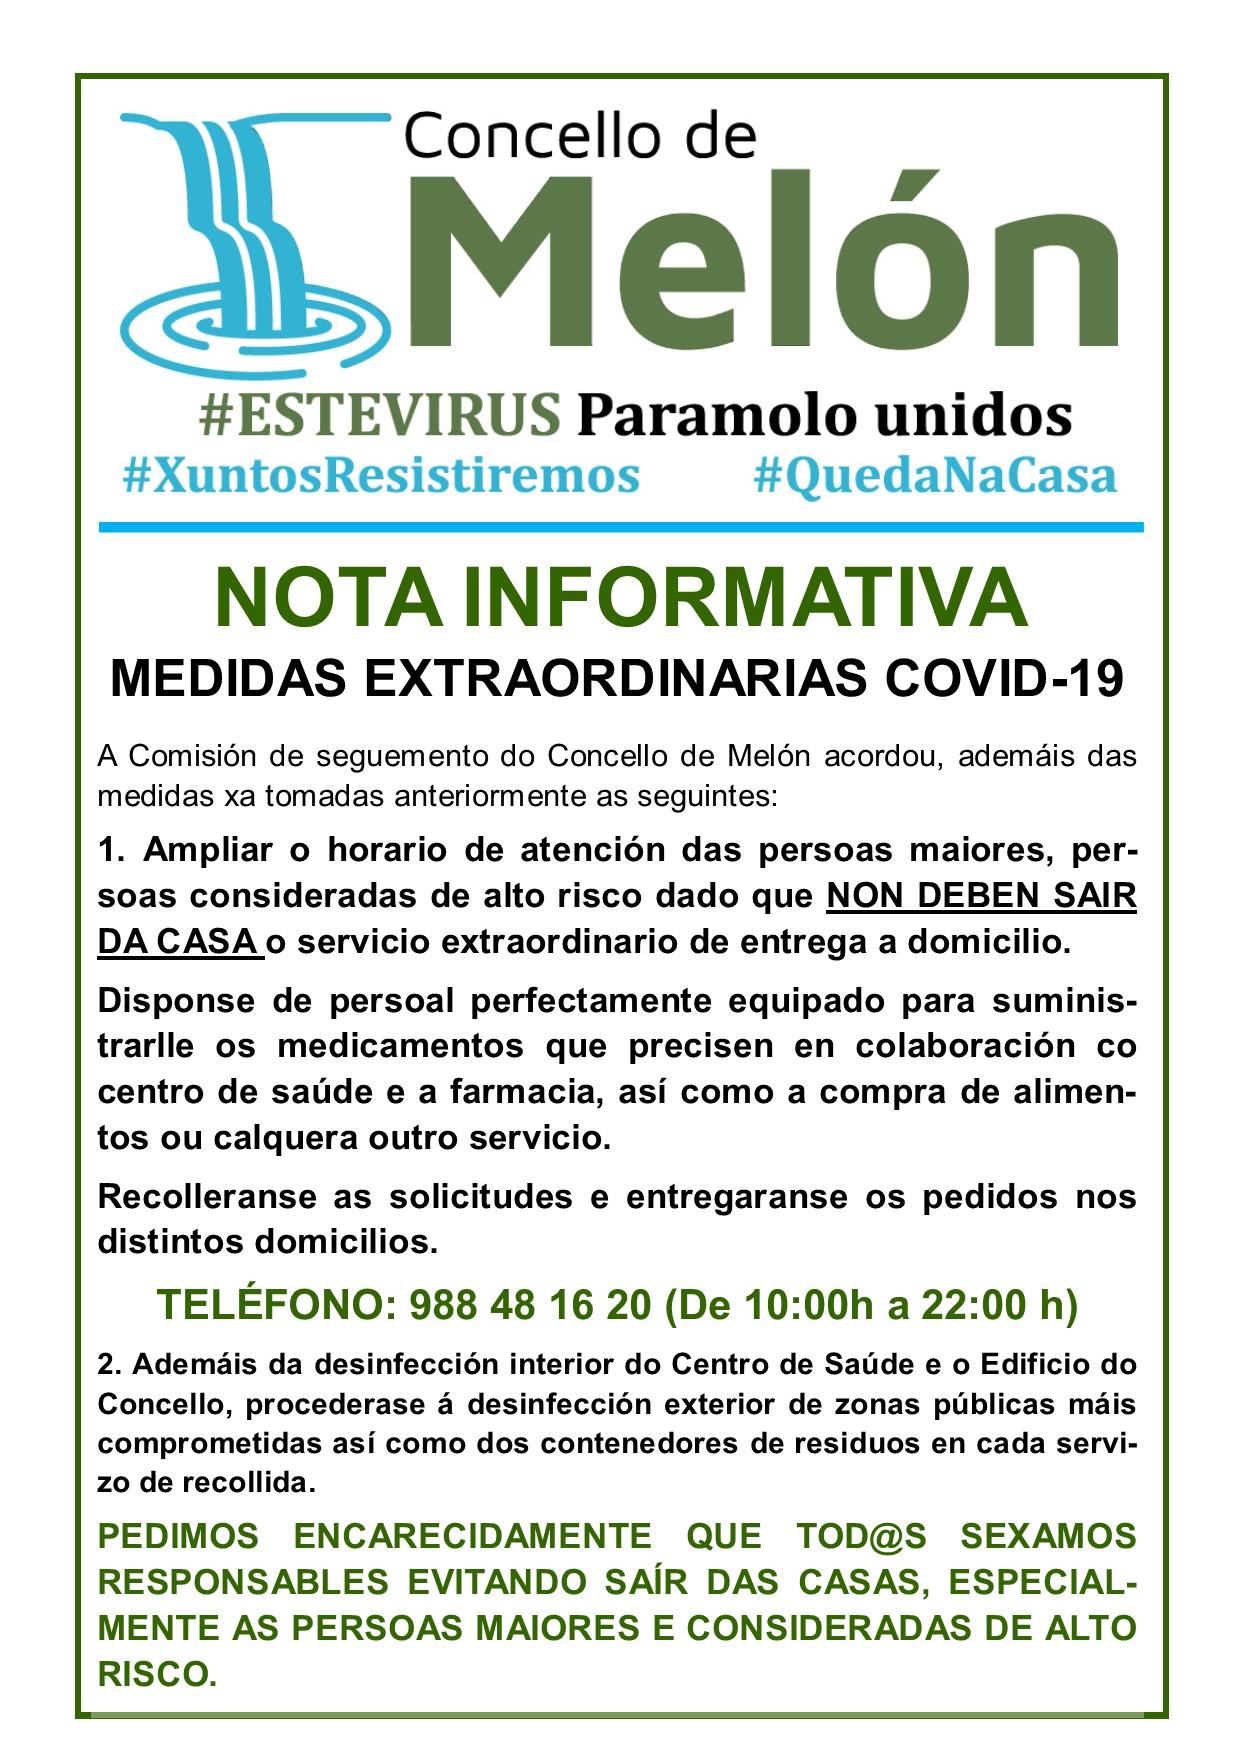 NOTA INFORMATIVA COVID-19